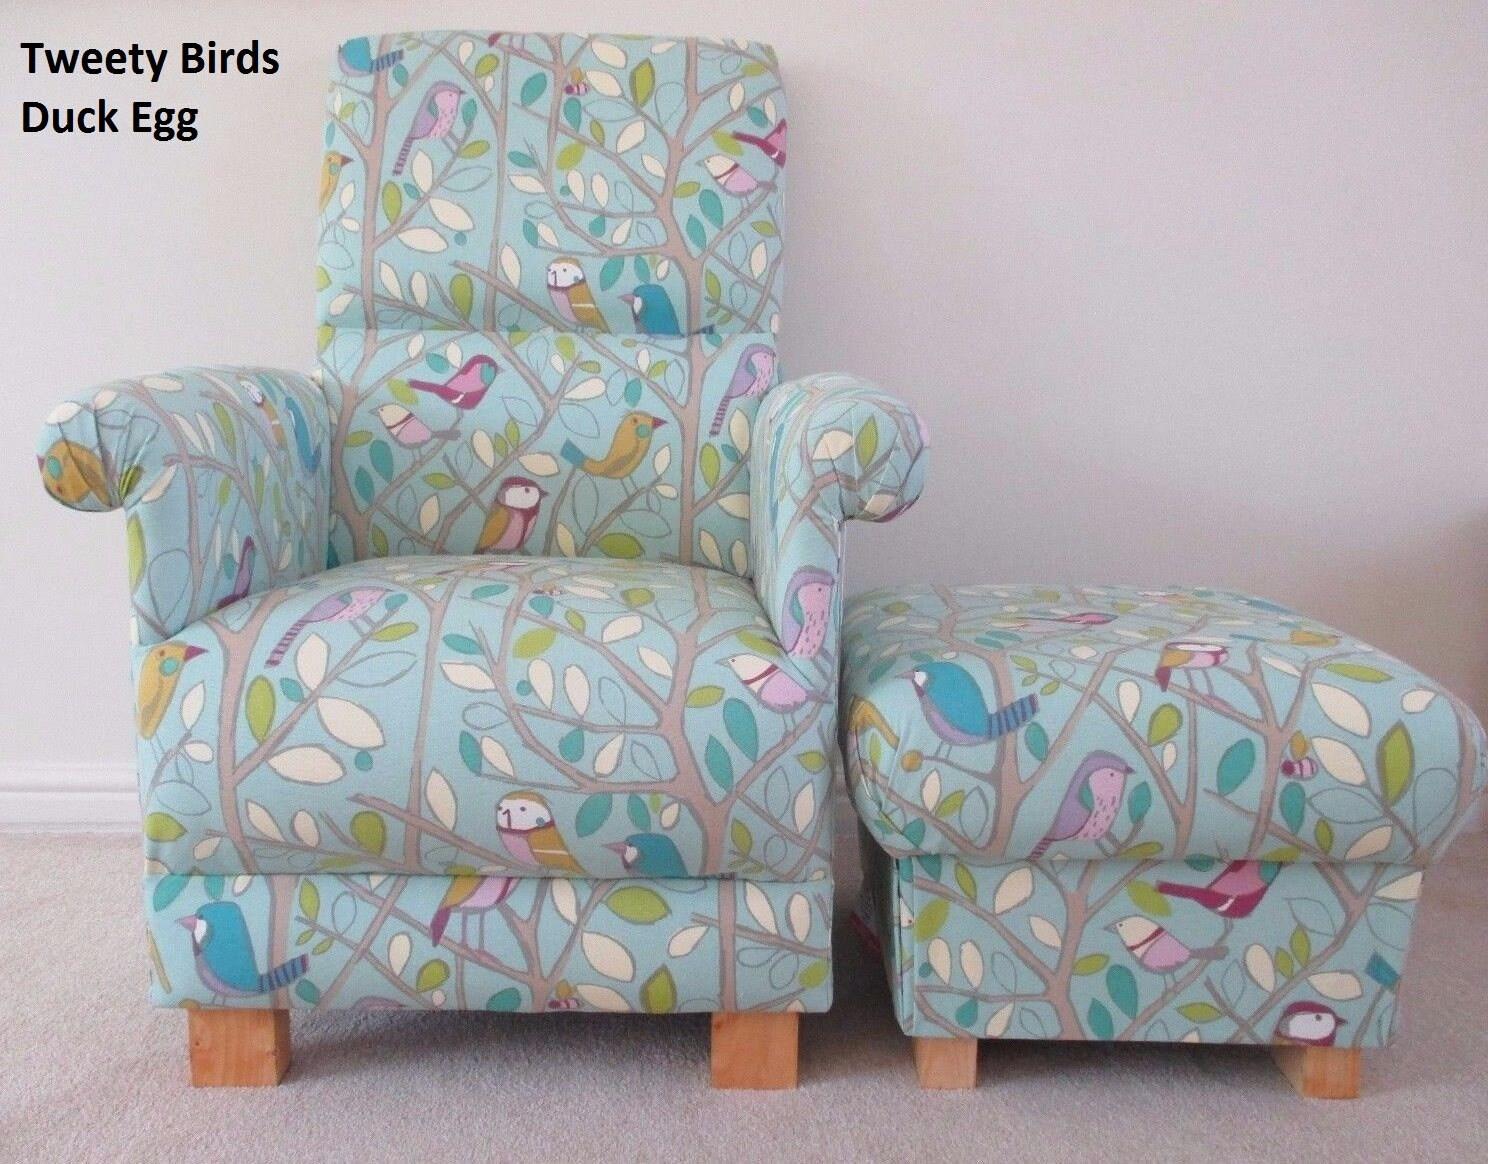 Tweety Birds Fabric Adult Chair  Footstool Nursery Armchair Duck Egg Bird Pouffe Bedroom Accent Lilac Green